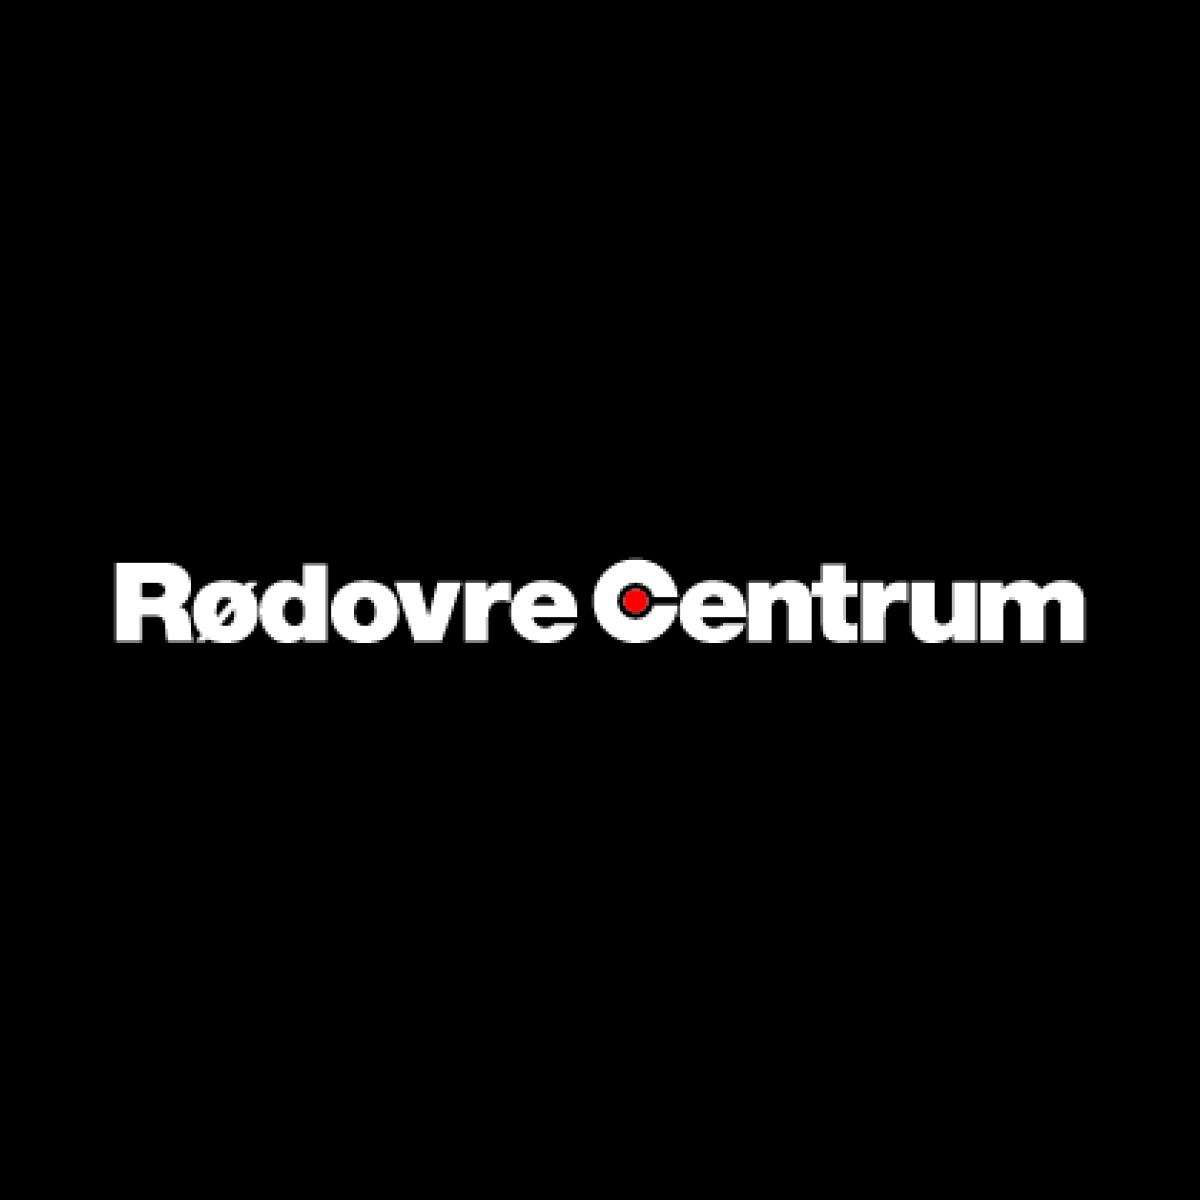 Rødovre Centrum Innocleaner Dk Aps